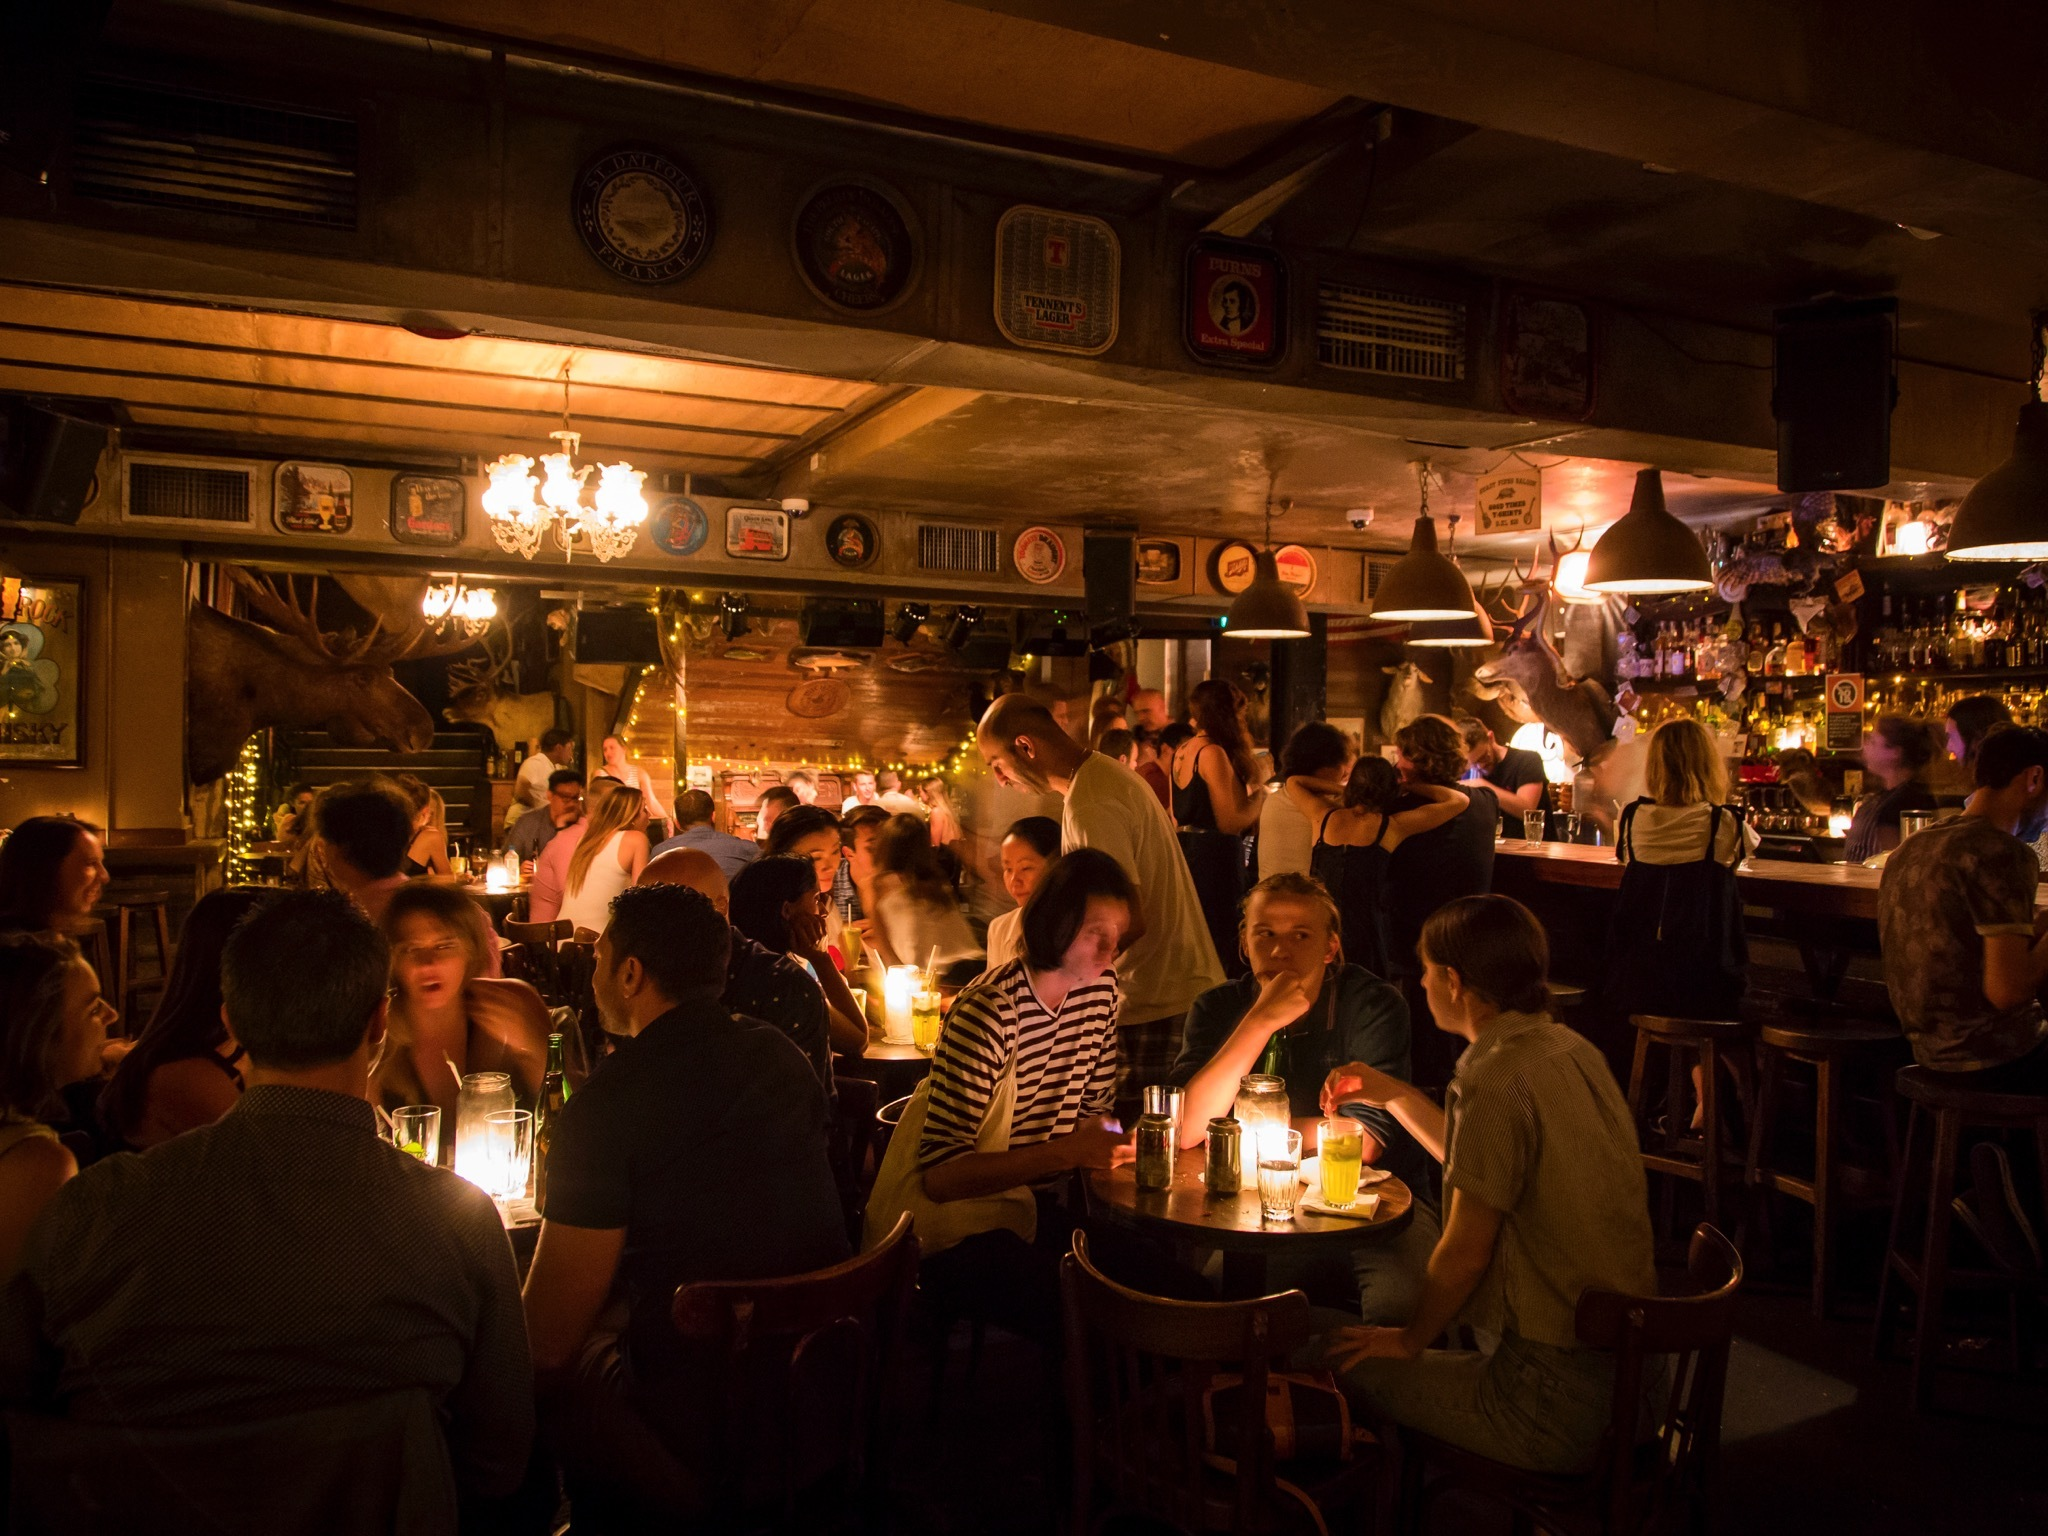 Shady Pines Saloon: Ten Years